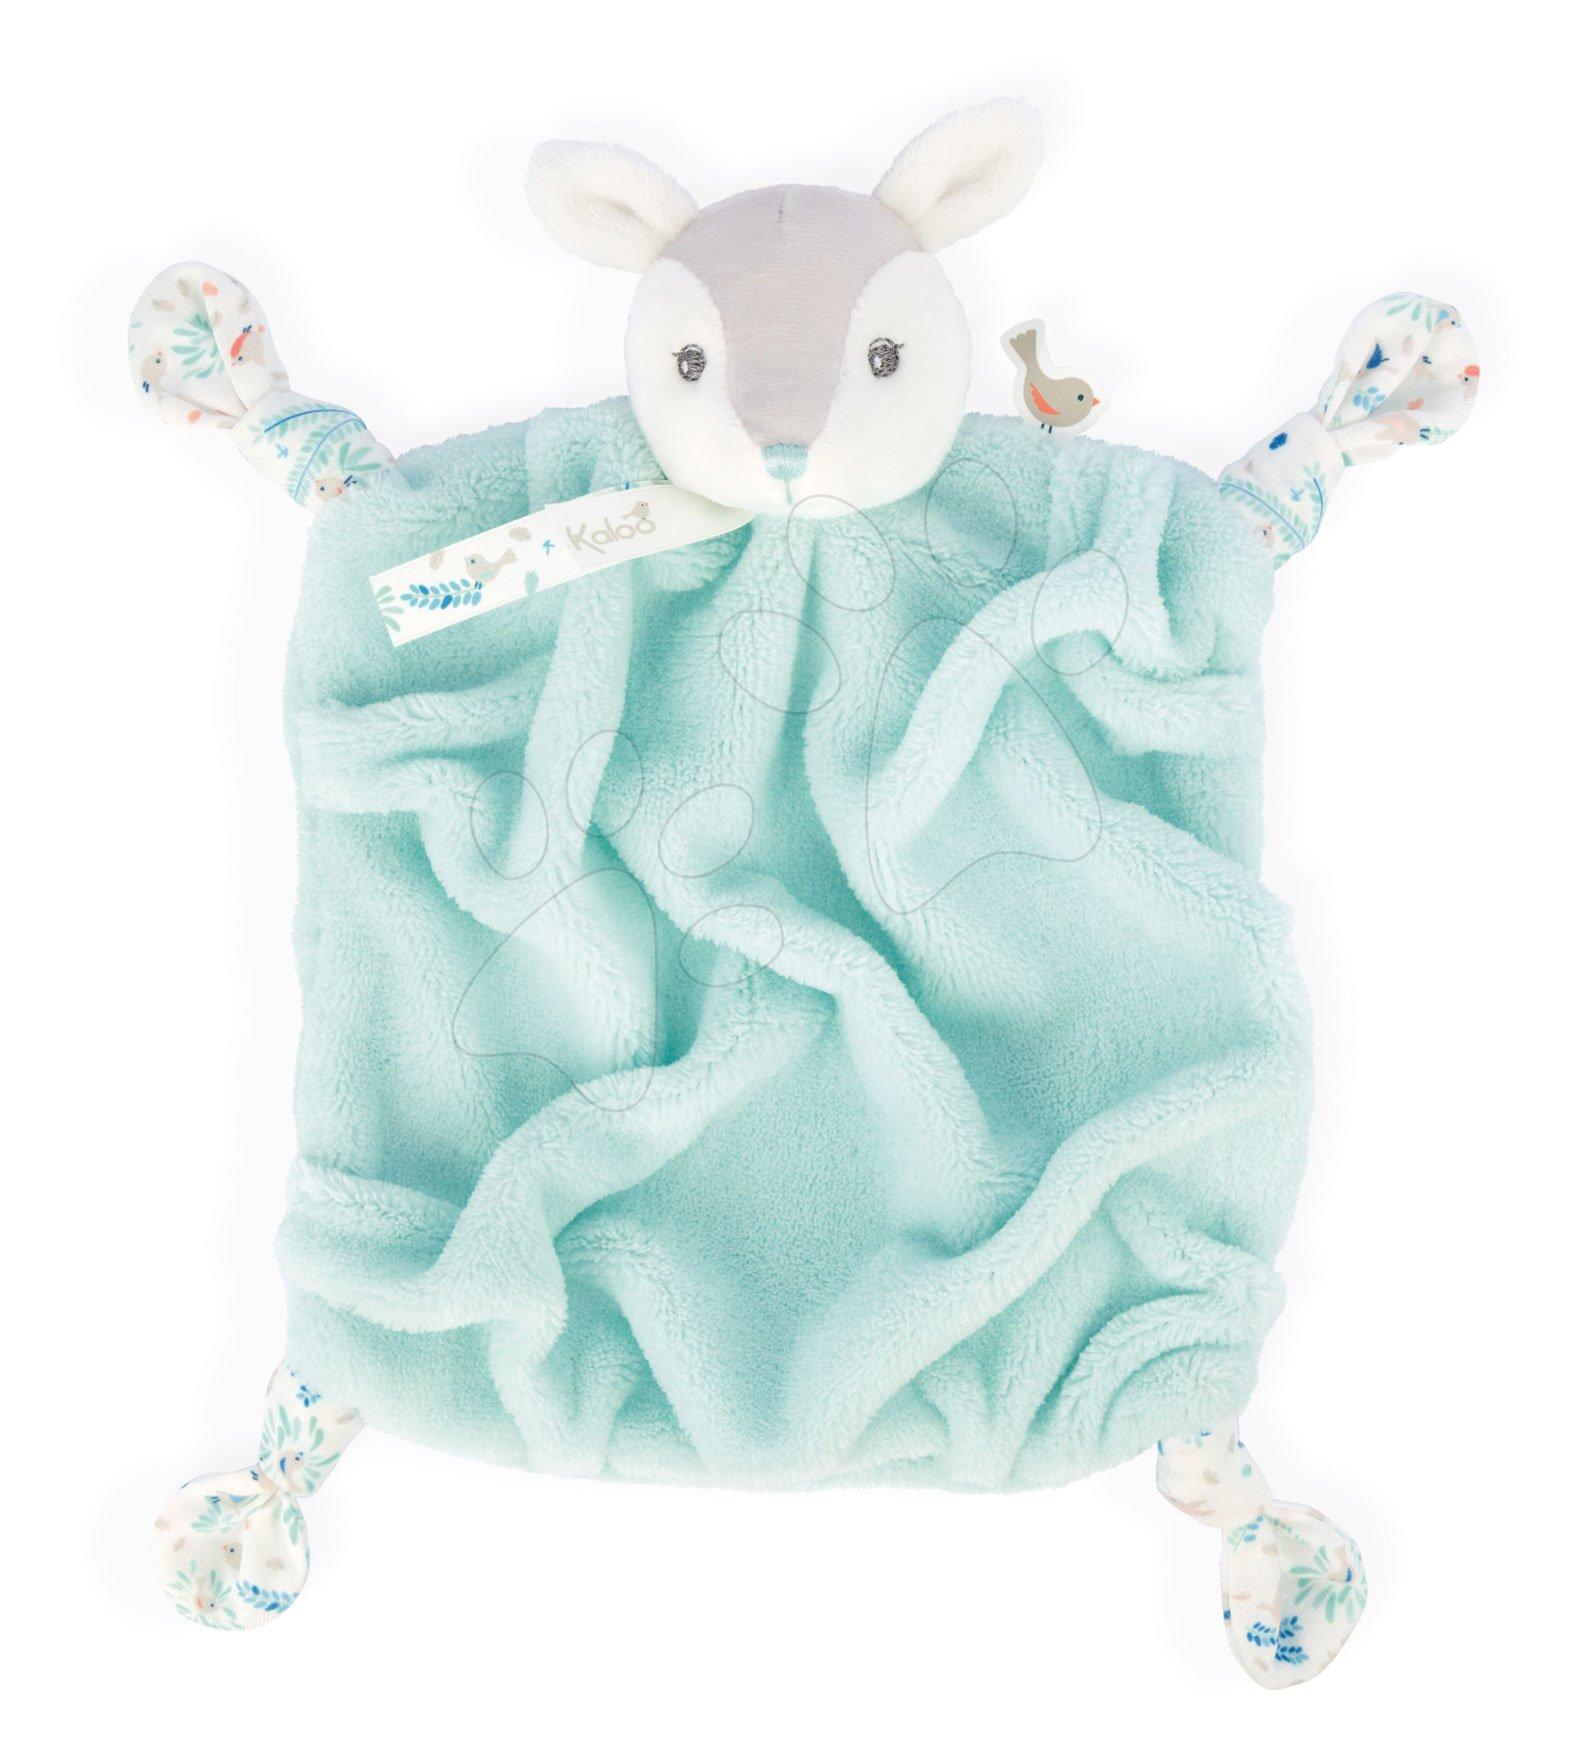 Plyšová srnka maznáčik Plume Doudou Fawn Water Kaloo tyrkysový 20 cm pre bábätká v darčekovom balení od 0 mes